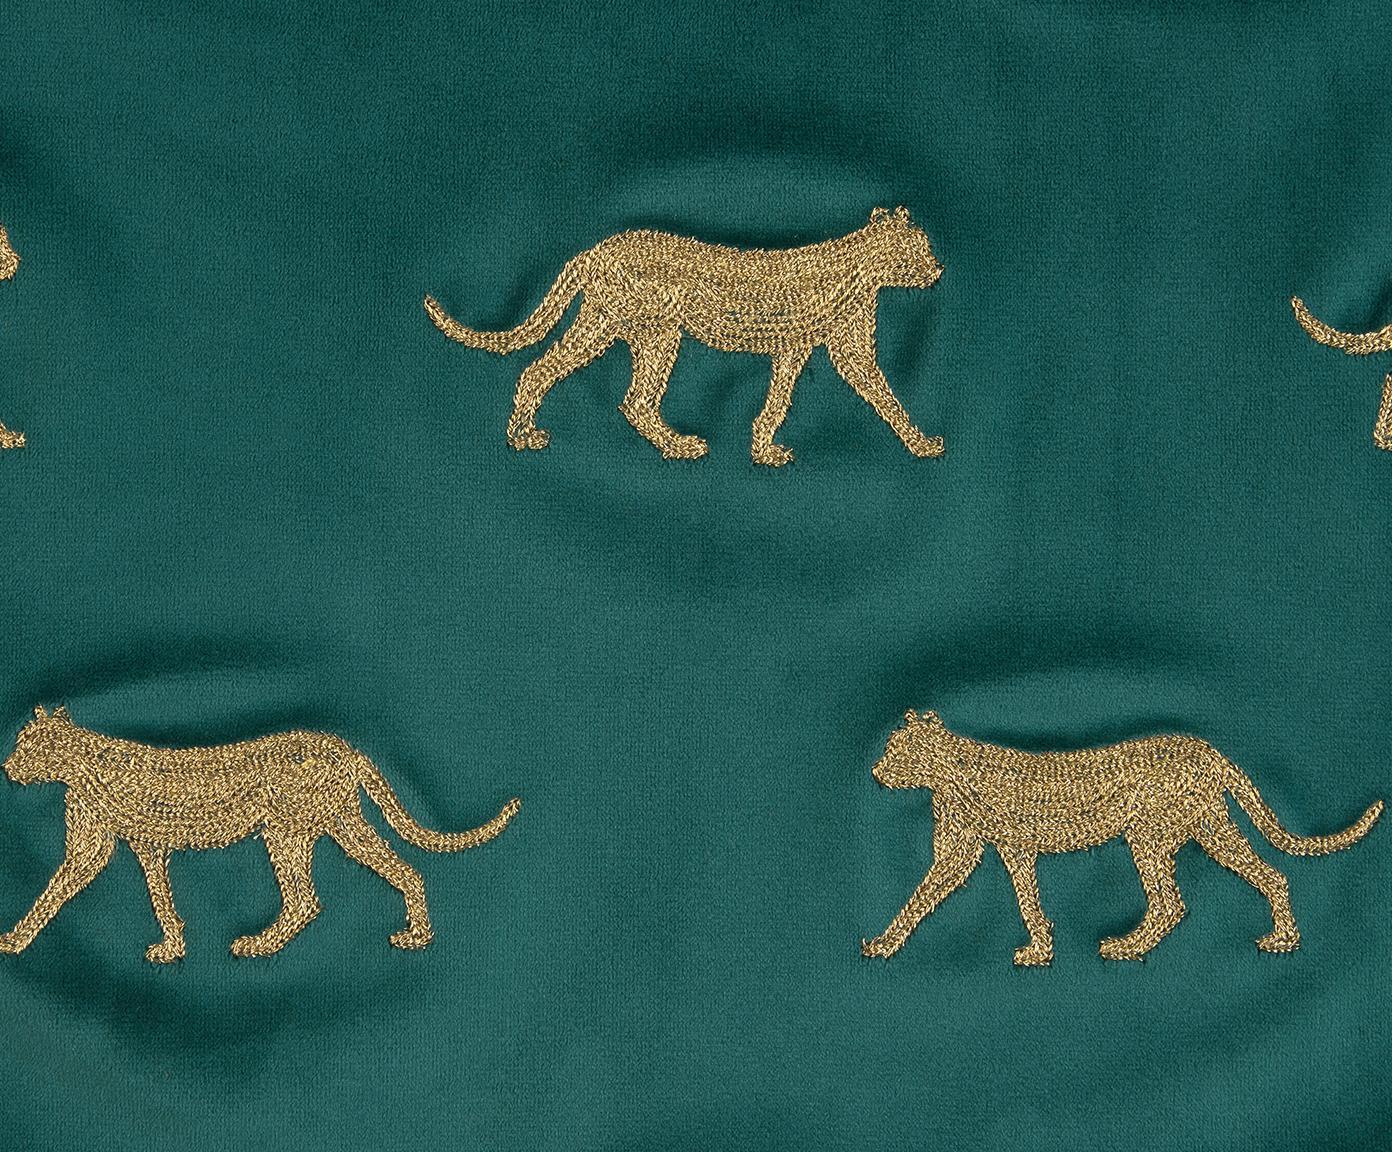 Bestickte Samt-Kissenhülle Cheetah in Grün/Gold, 100% Polyestersamt, Dunkelgrün, Goldfarben, 40 x 40 cm